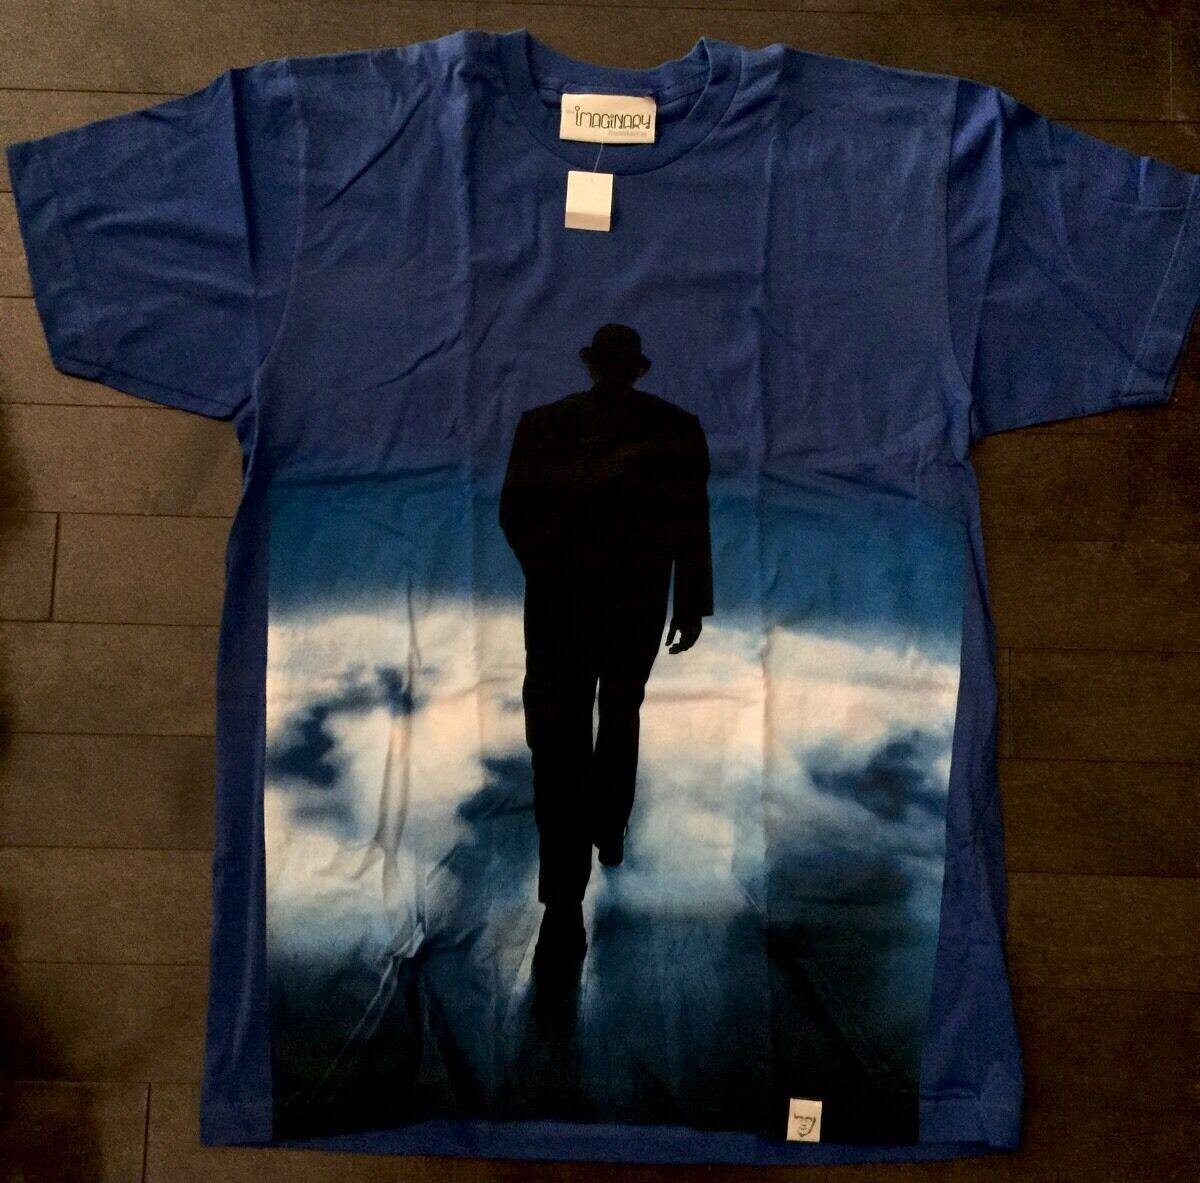 Imaginary Foundation T-shirt (BRAND NEW) Size Lrg ( Crooks Orisue A )